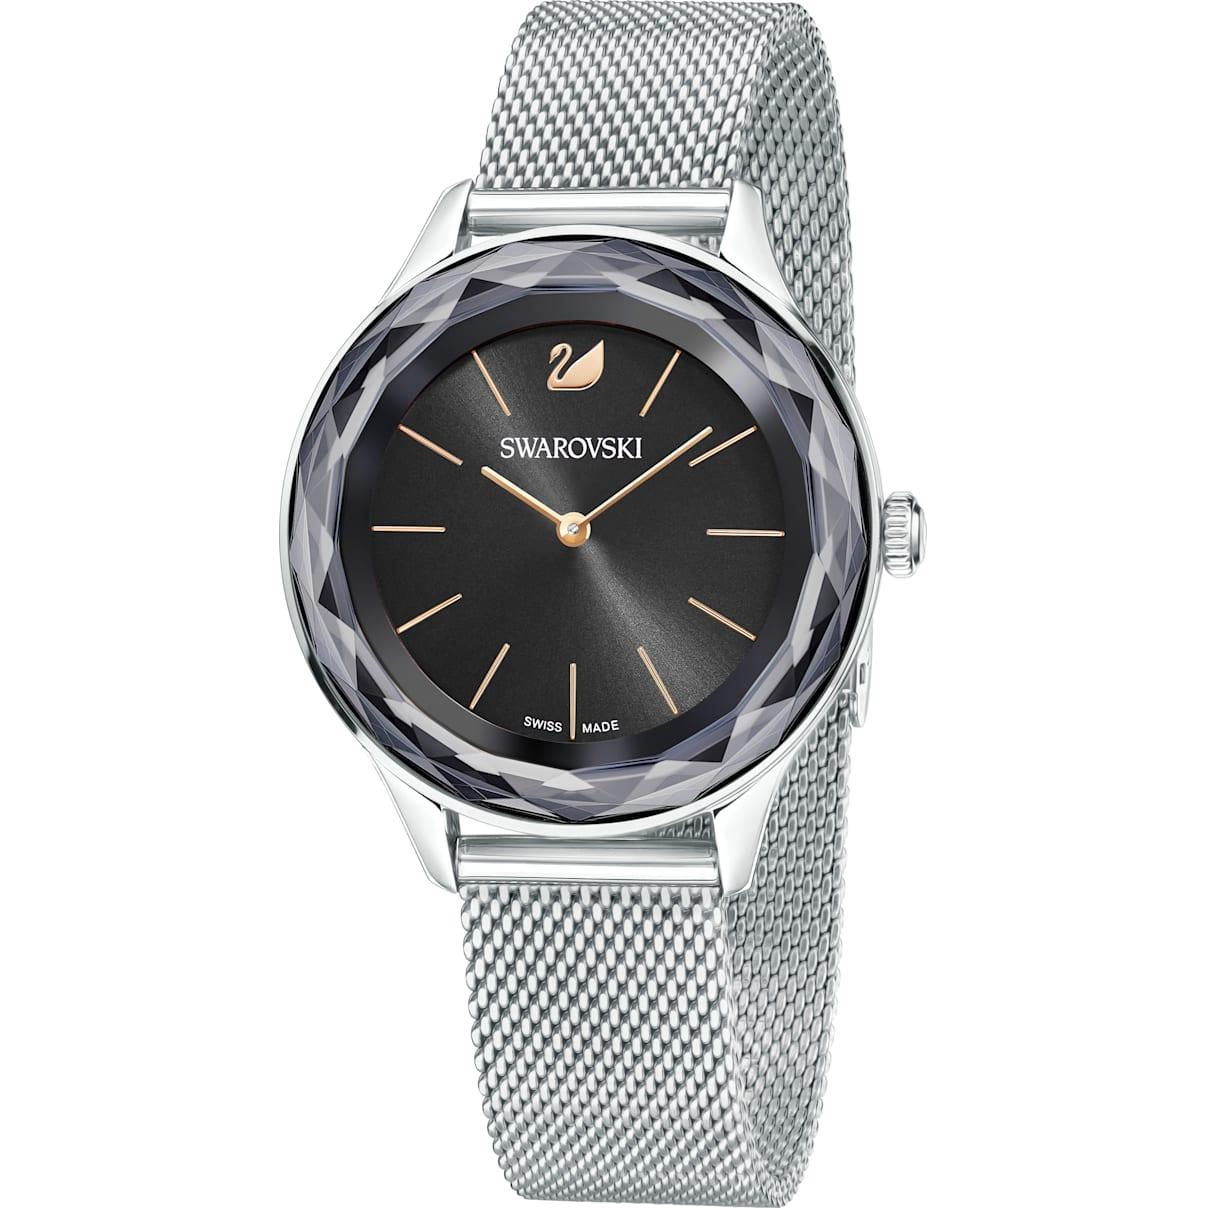 Swarovski Octea Nova Watch, Milanese bracelet, Black, Stainless steel